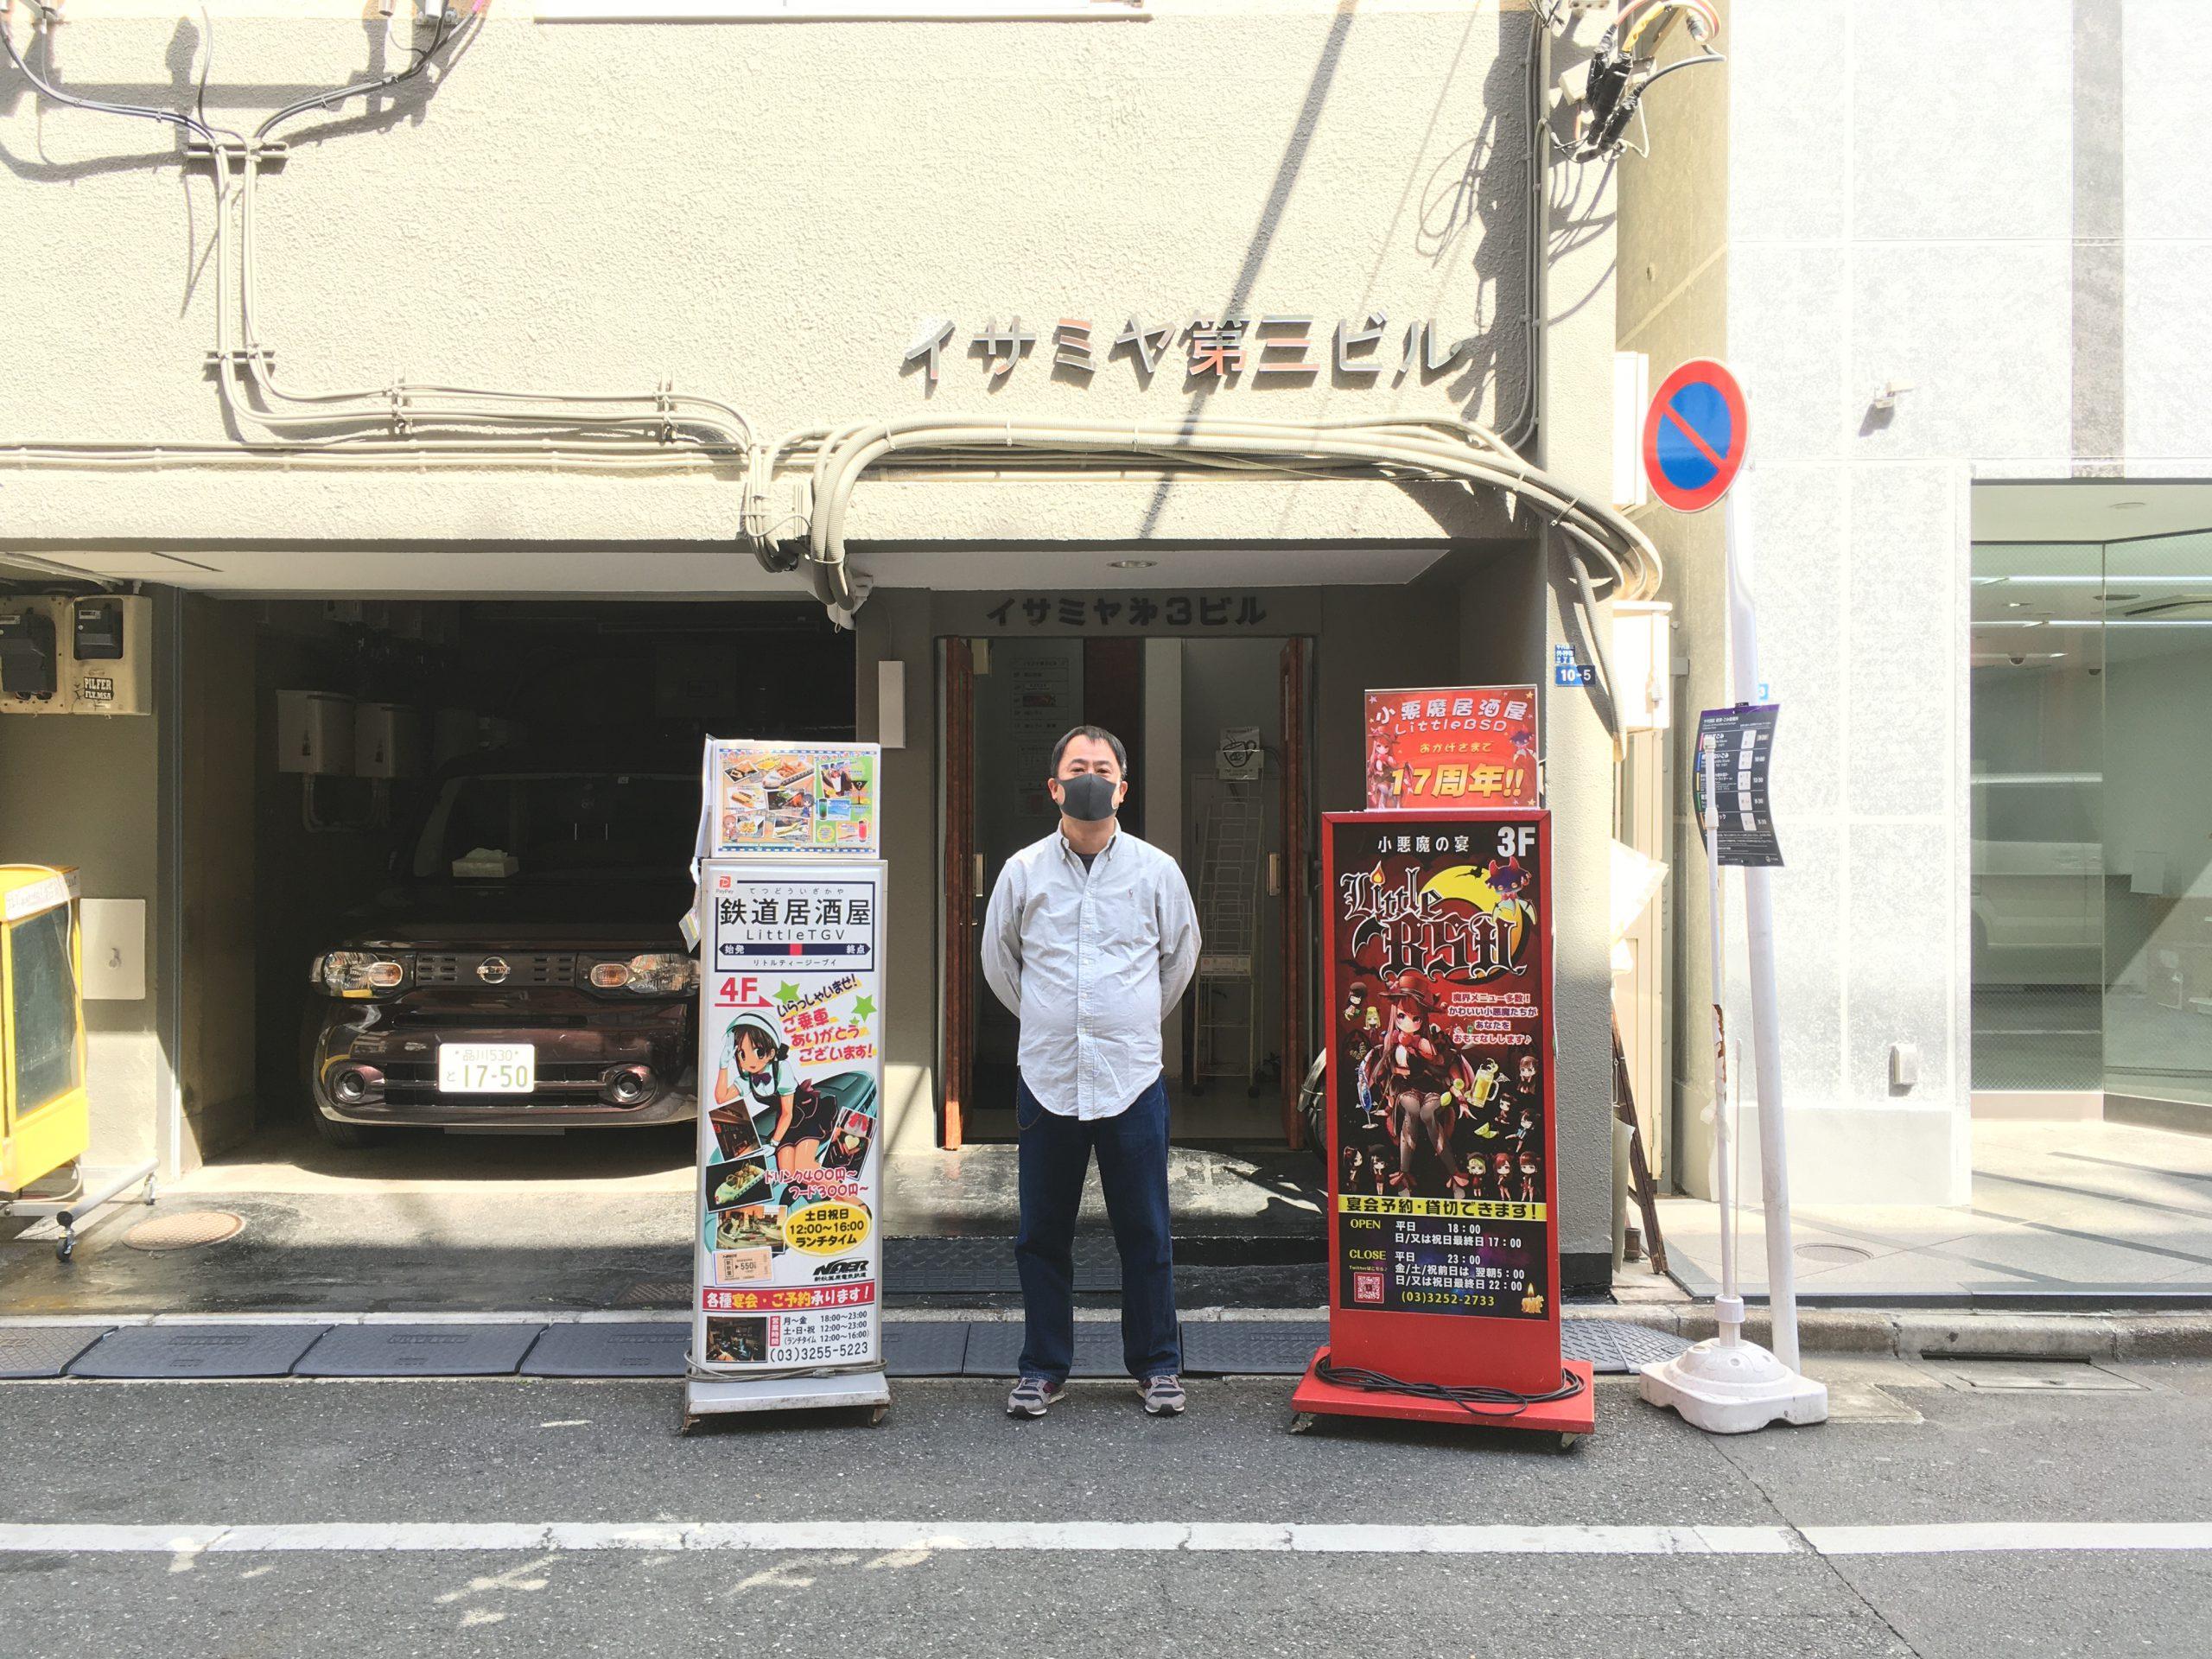 坪川学<br>(株式会社 Licurio)